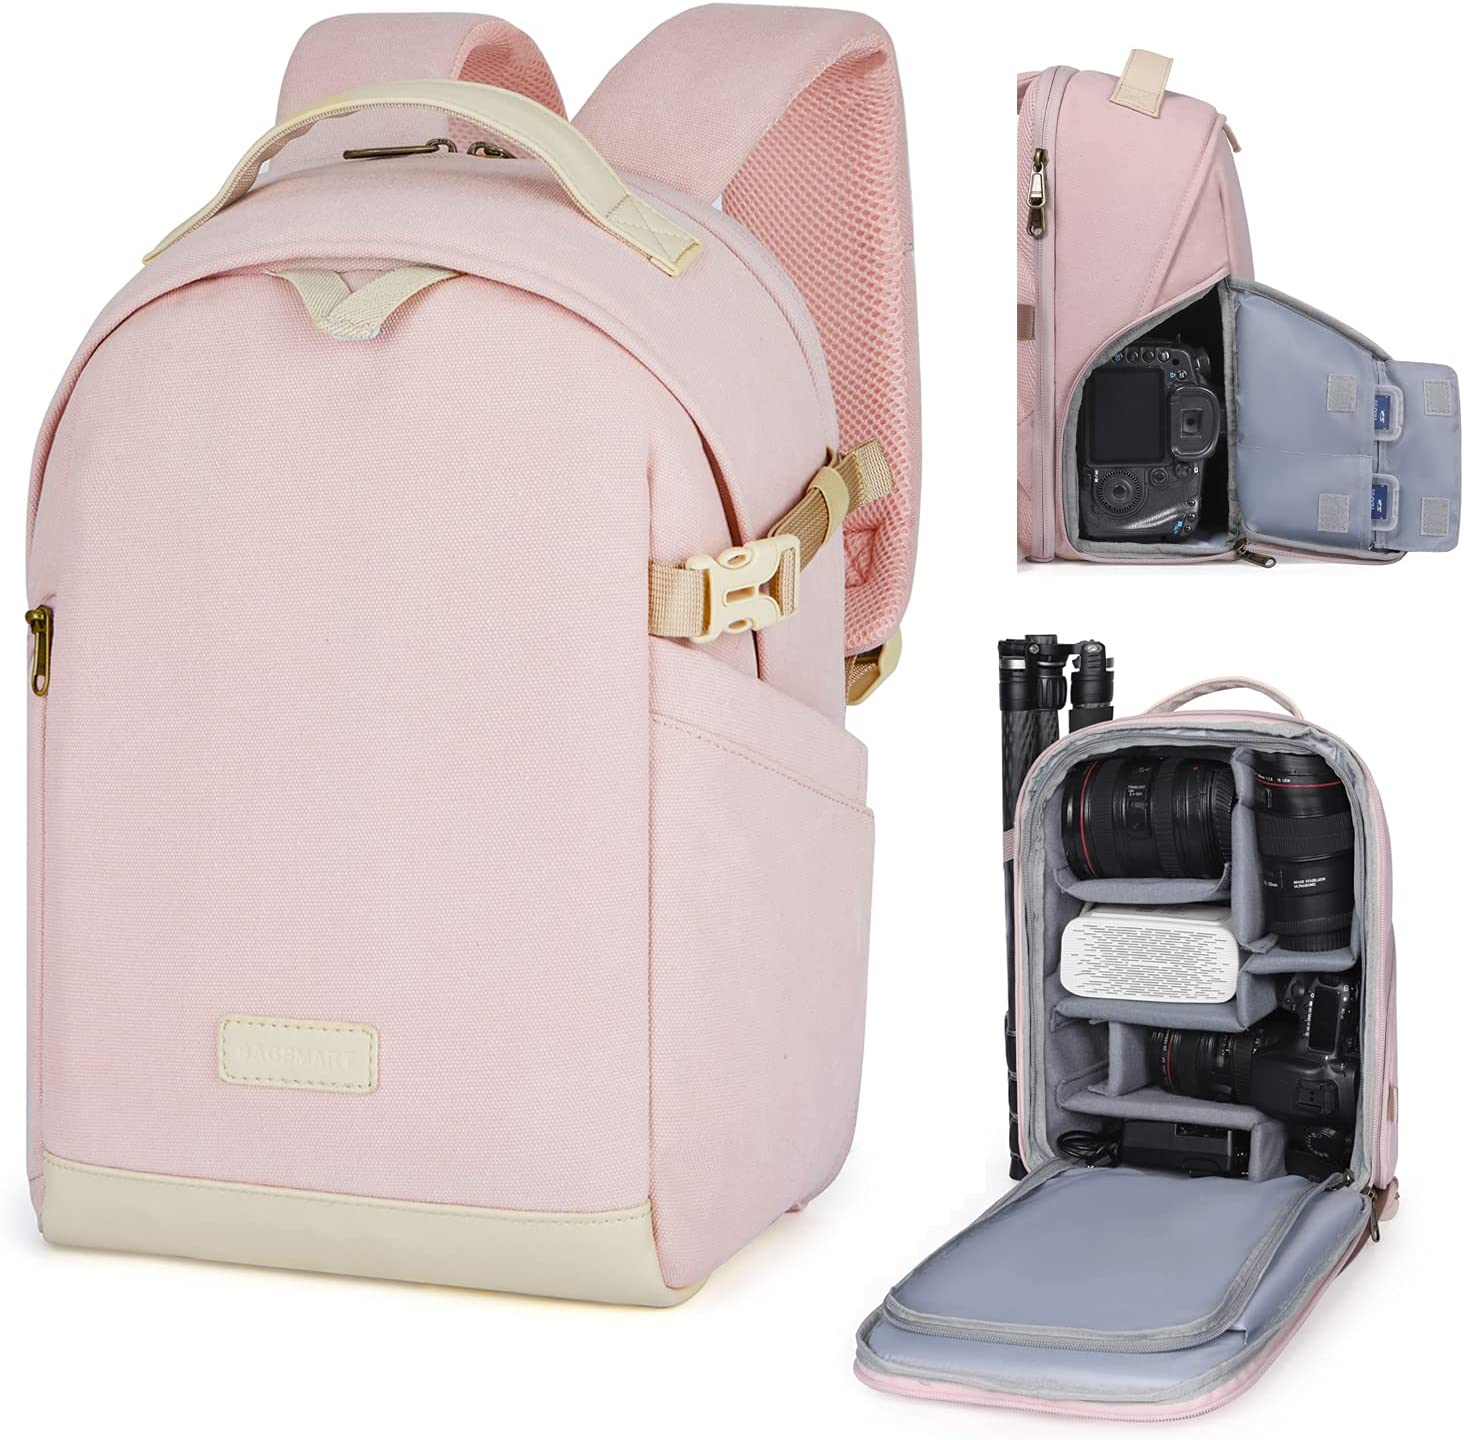 BAGSMART Camera Backpack, DSLR SLR Canvas Camera Bag Fits 13.3 Inch Laptop Water Resistant with Rain Cover Tripod Holder,for Men Women,Canvas Pink